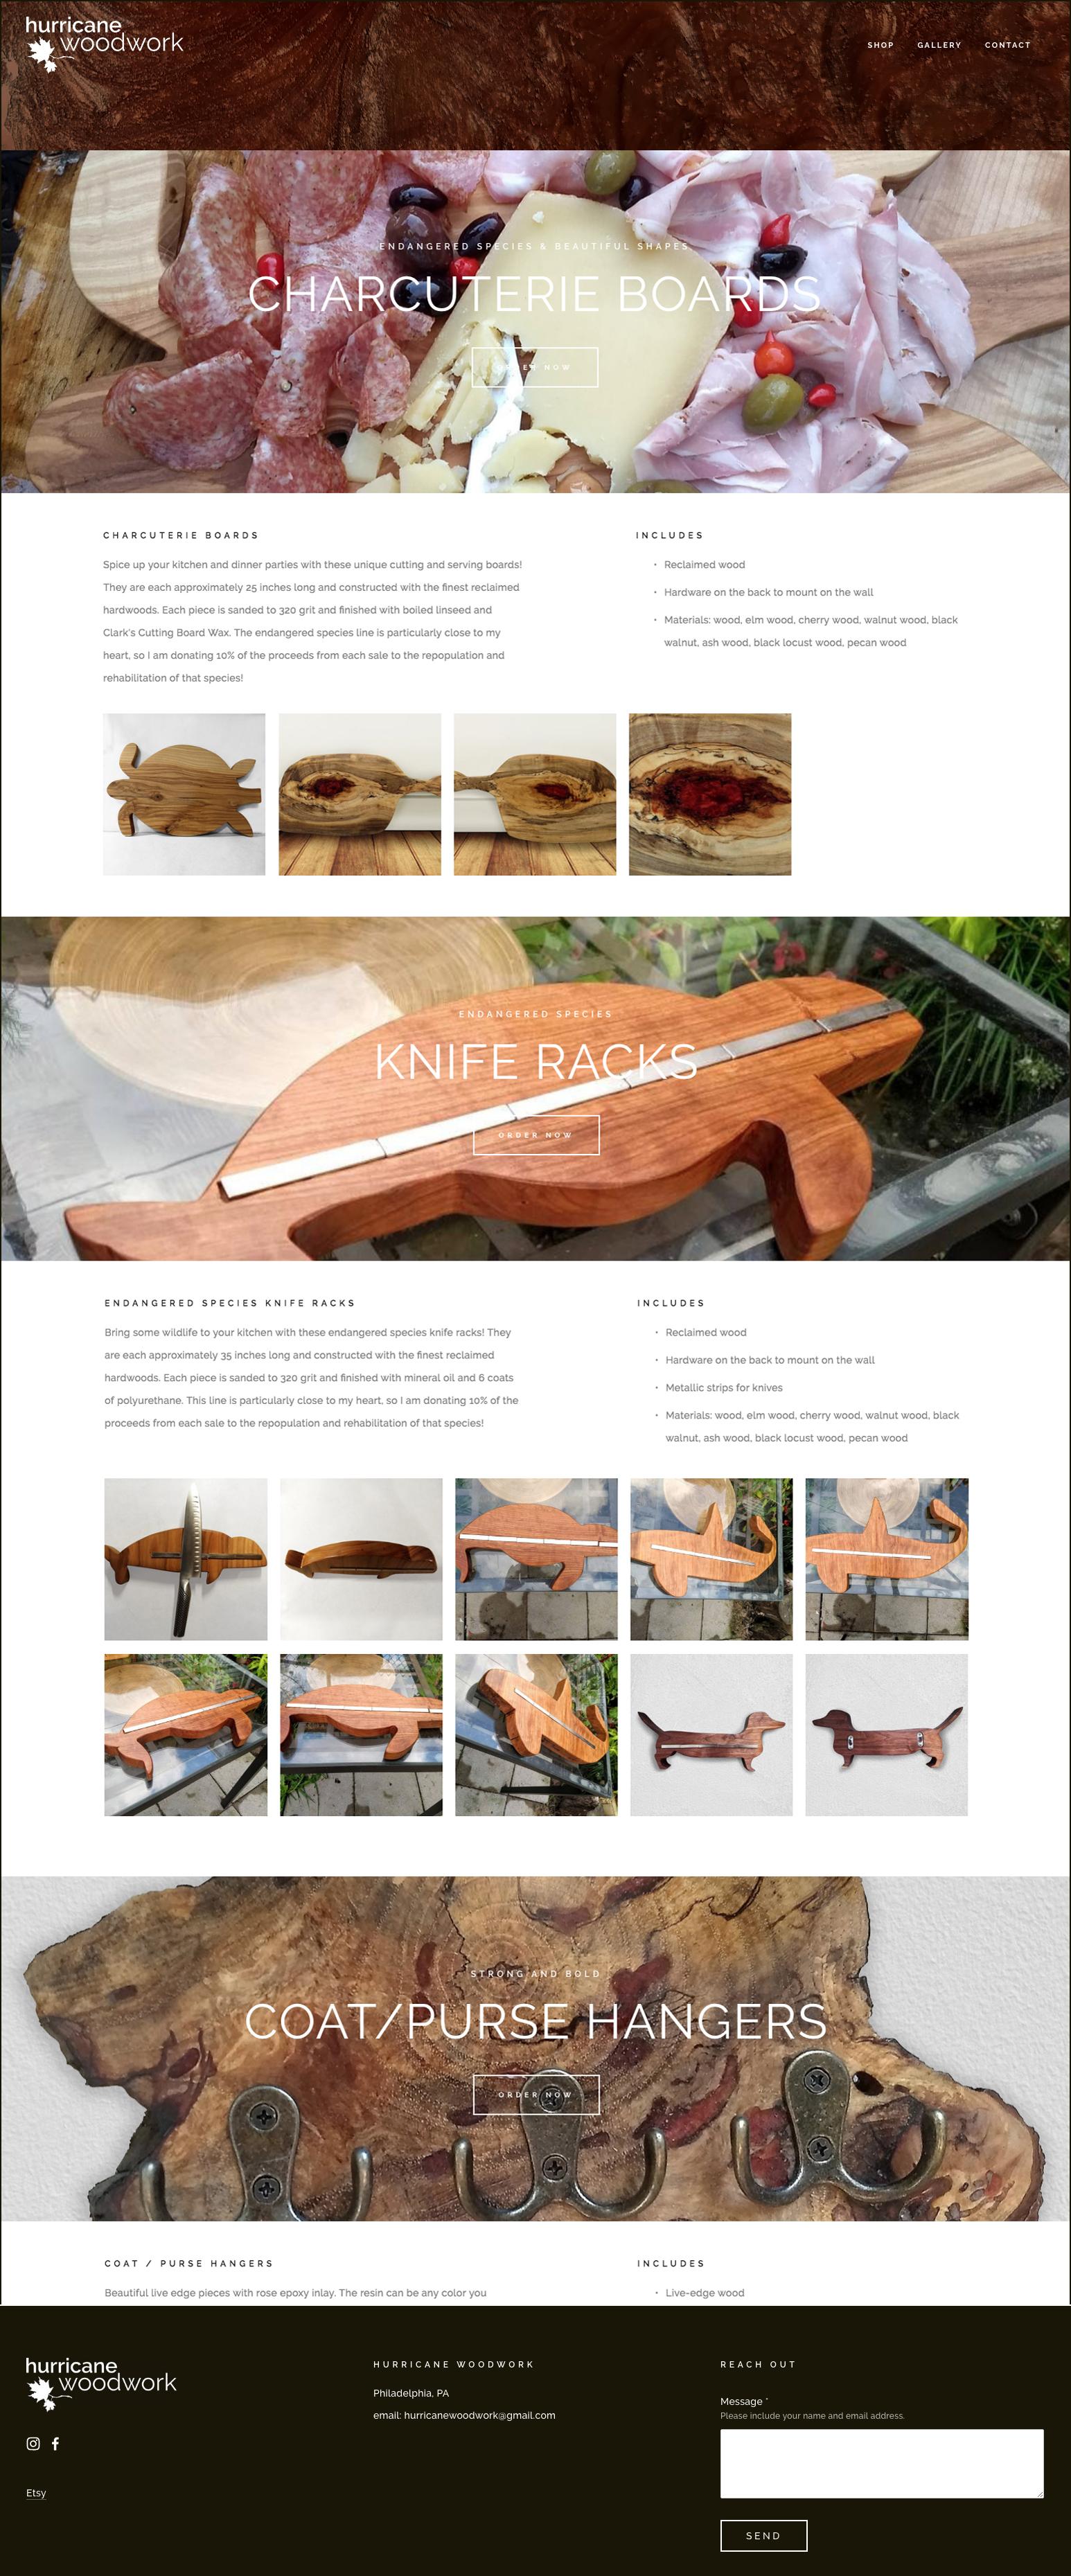 Hurricane-Woodwork-web-gallery-short.jpg